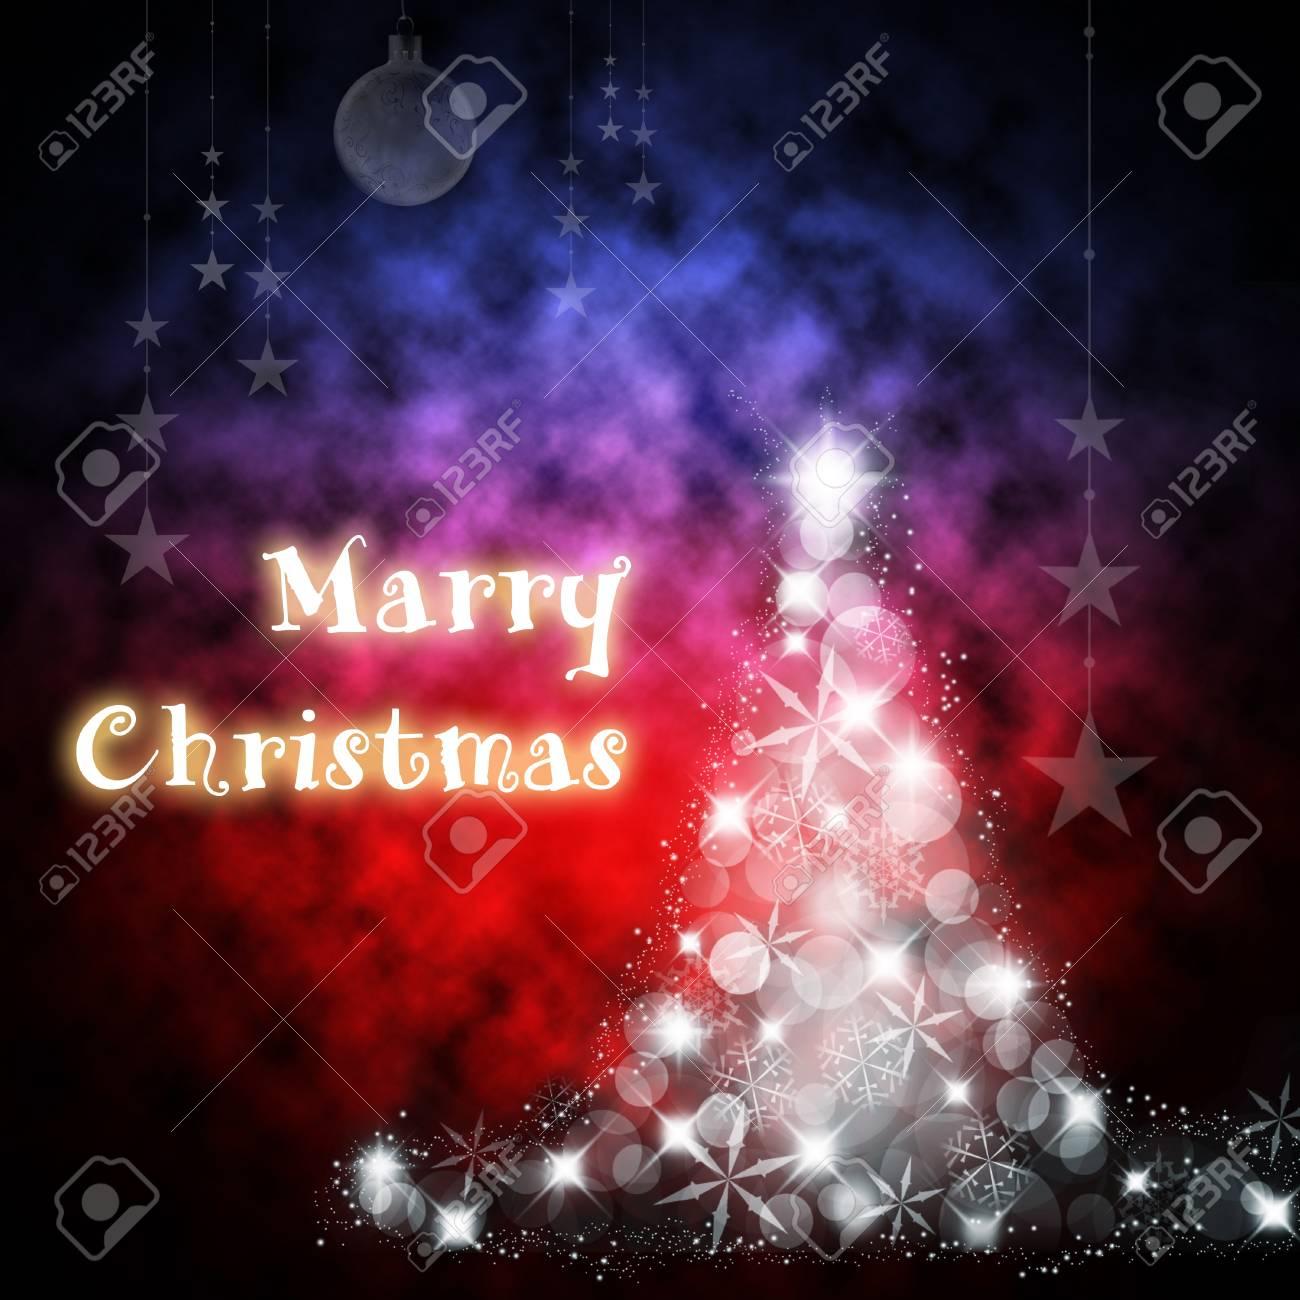 Mary Christmas holiday greeting cards. Stock Photo - 19741926